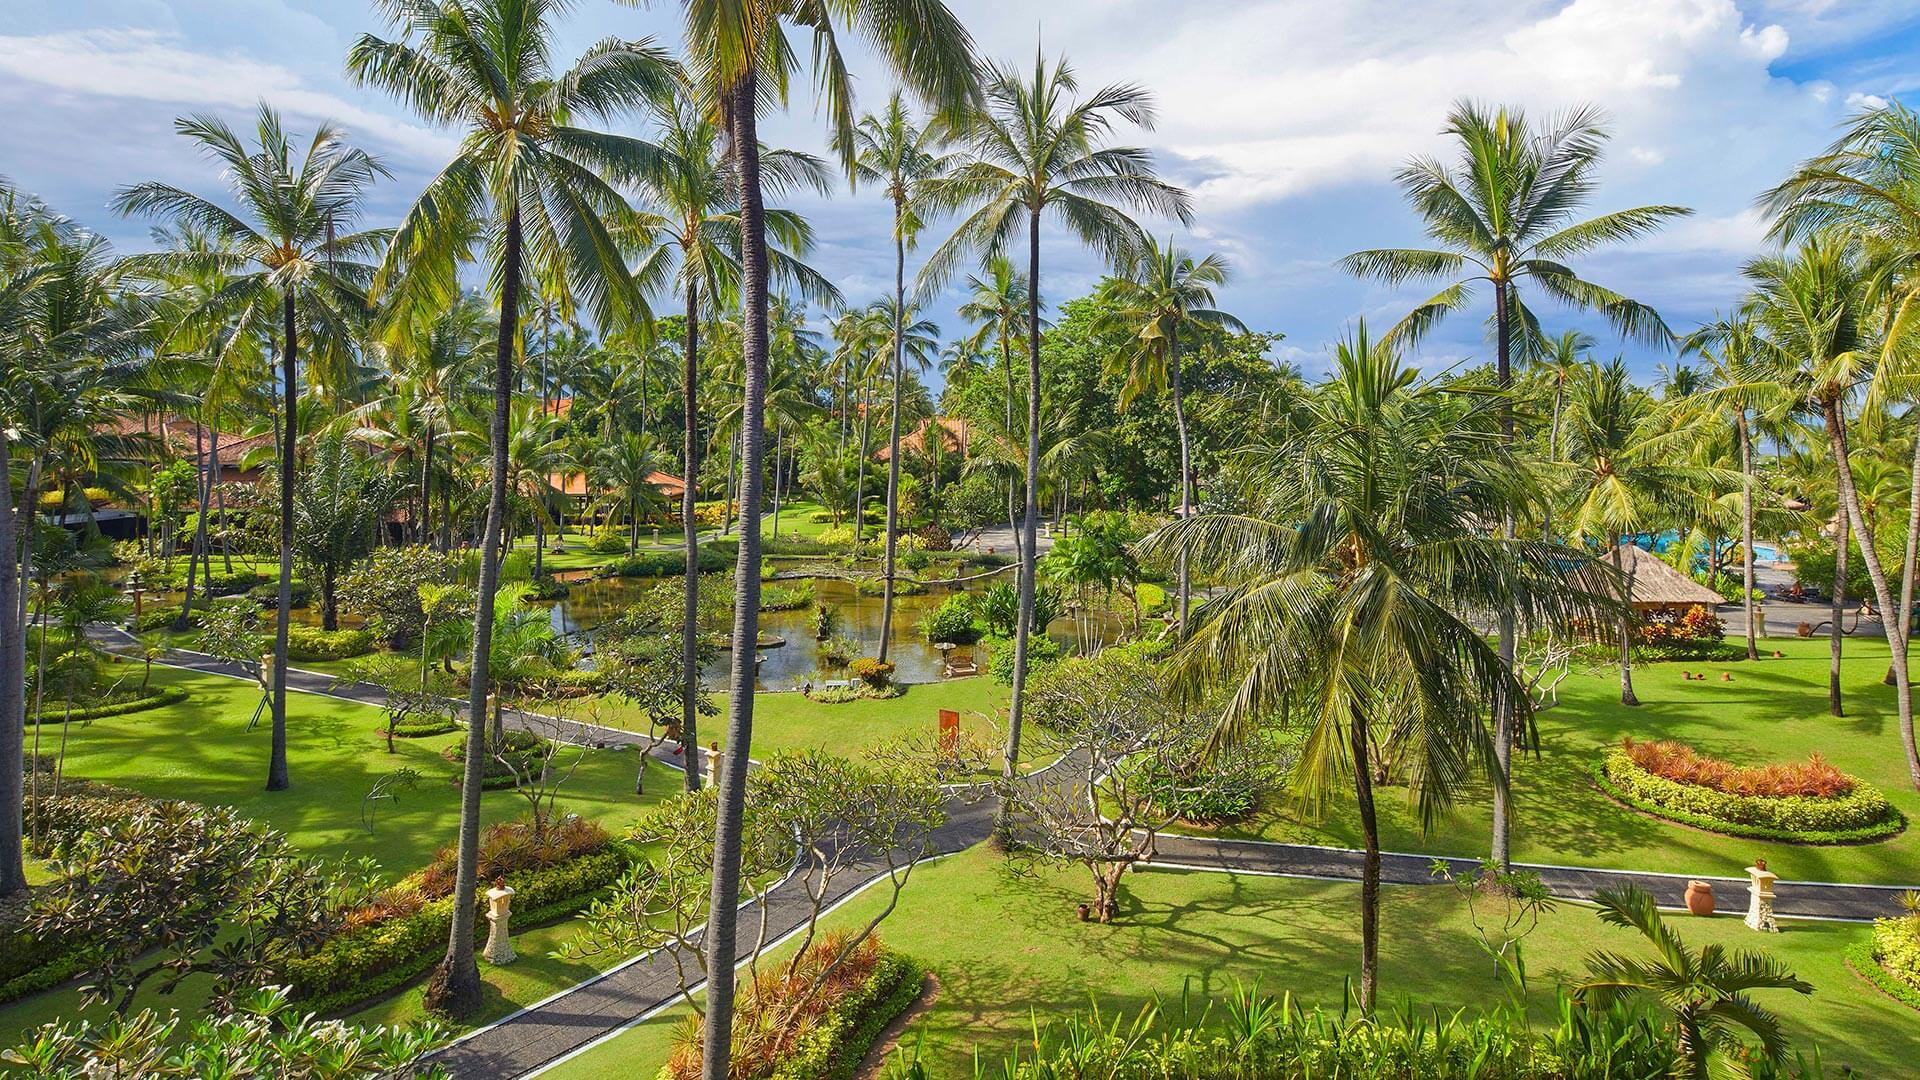 Melia Bali Garden View